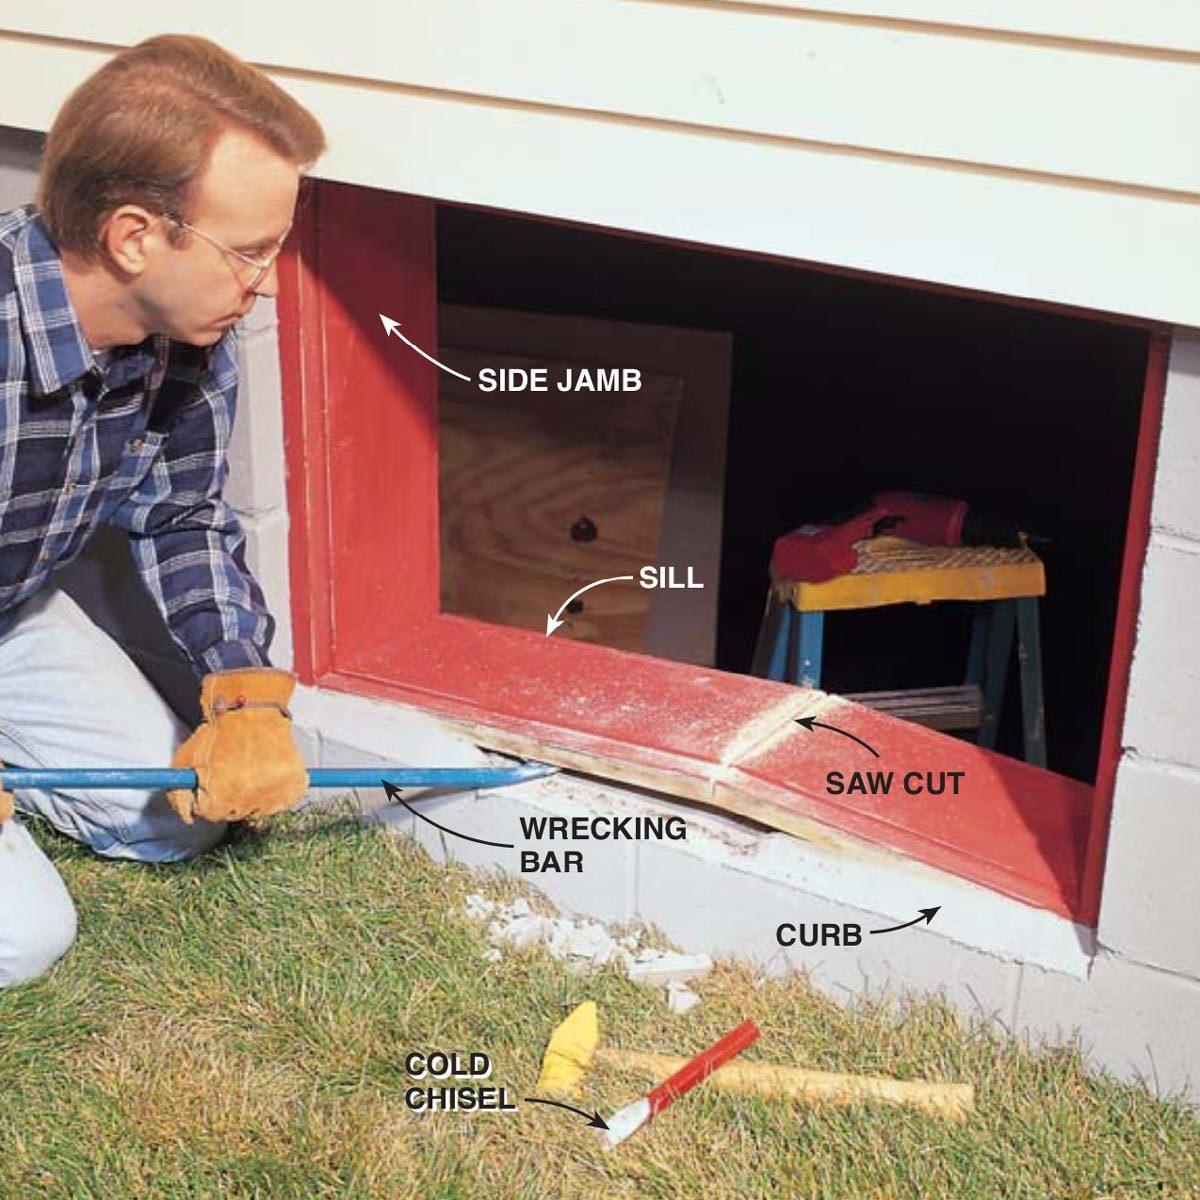 Installing Gl Block Windows In Basement The Family Handyman